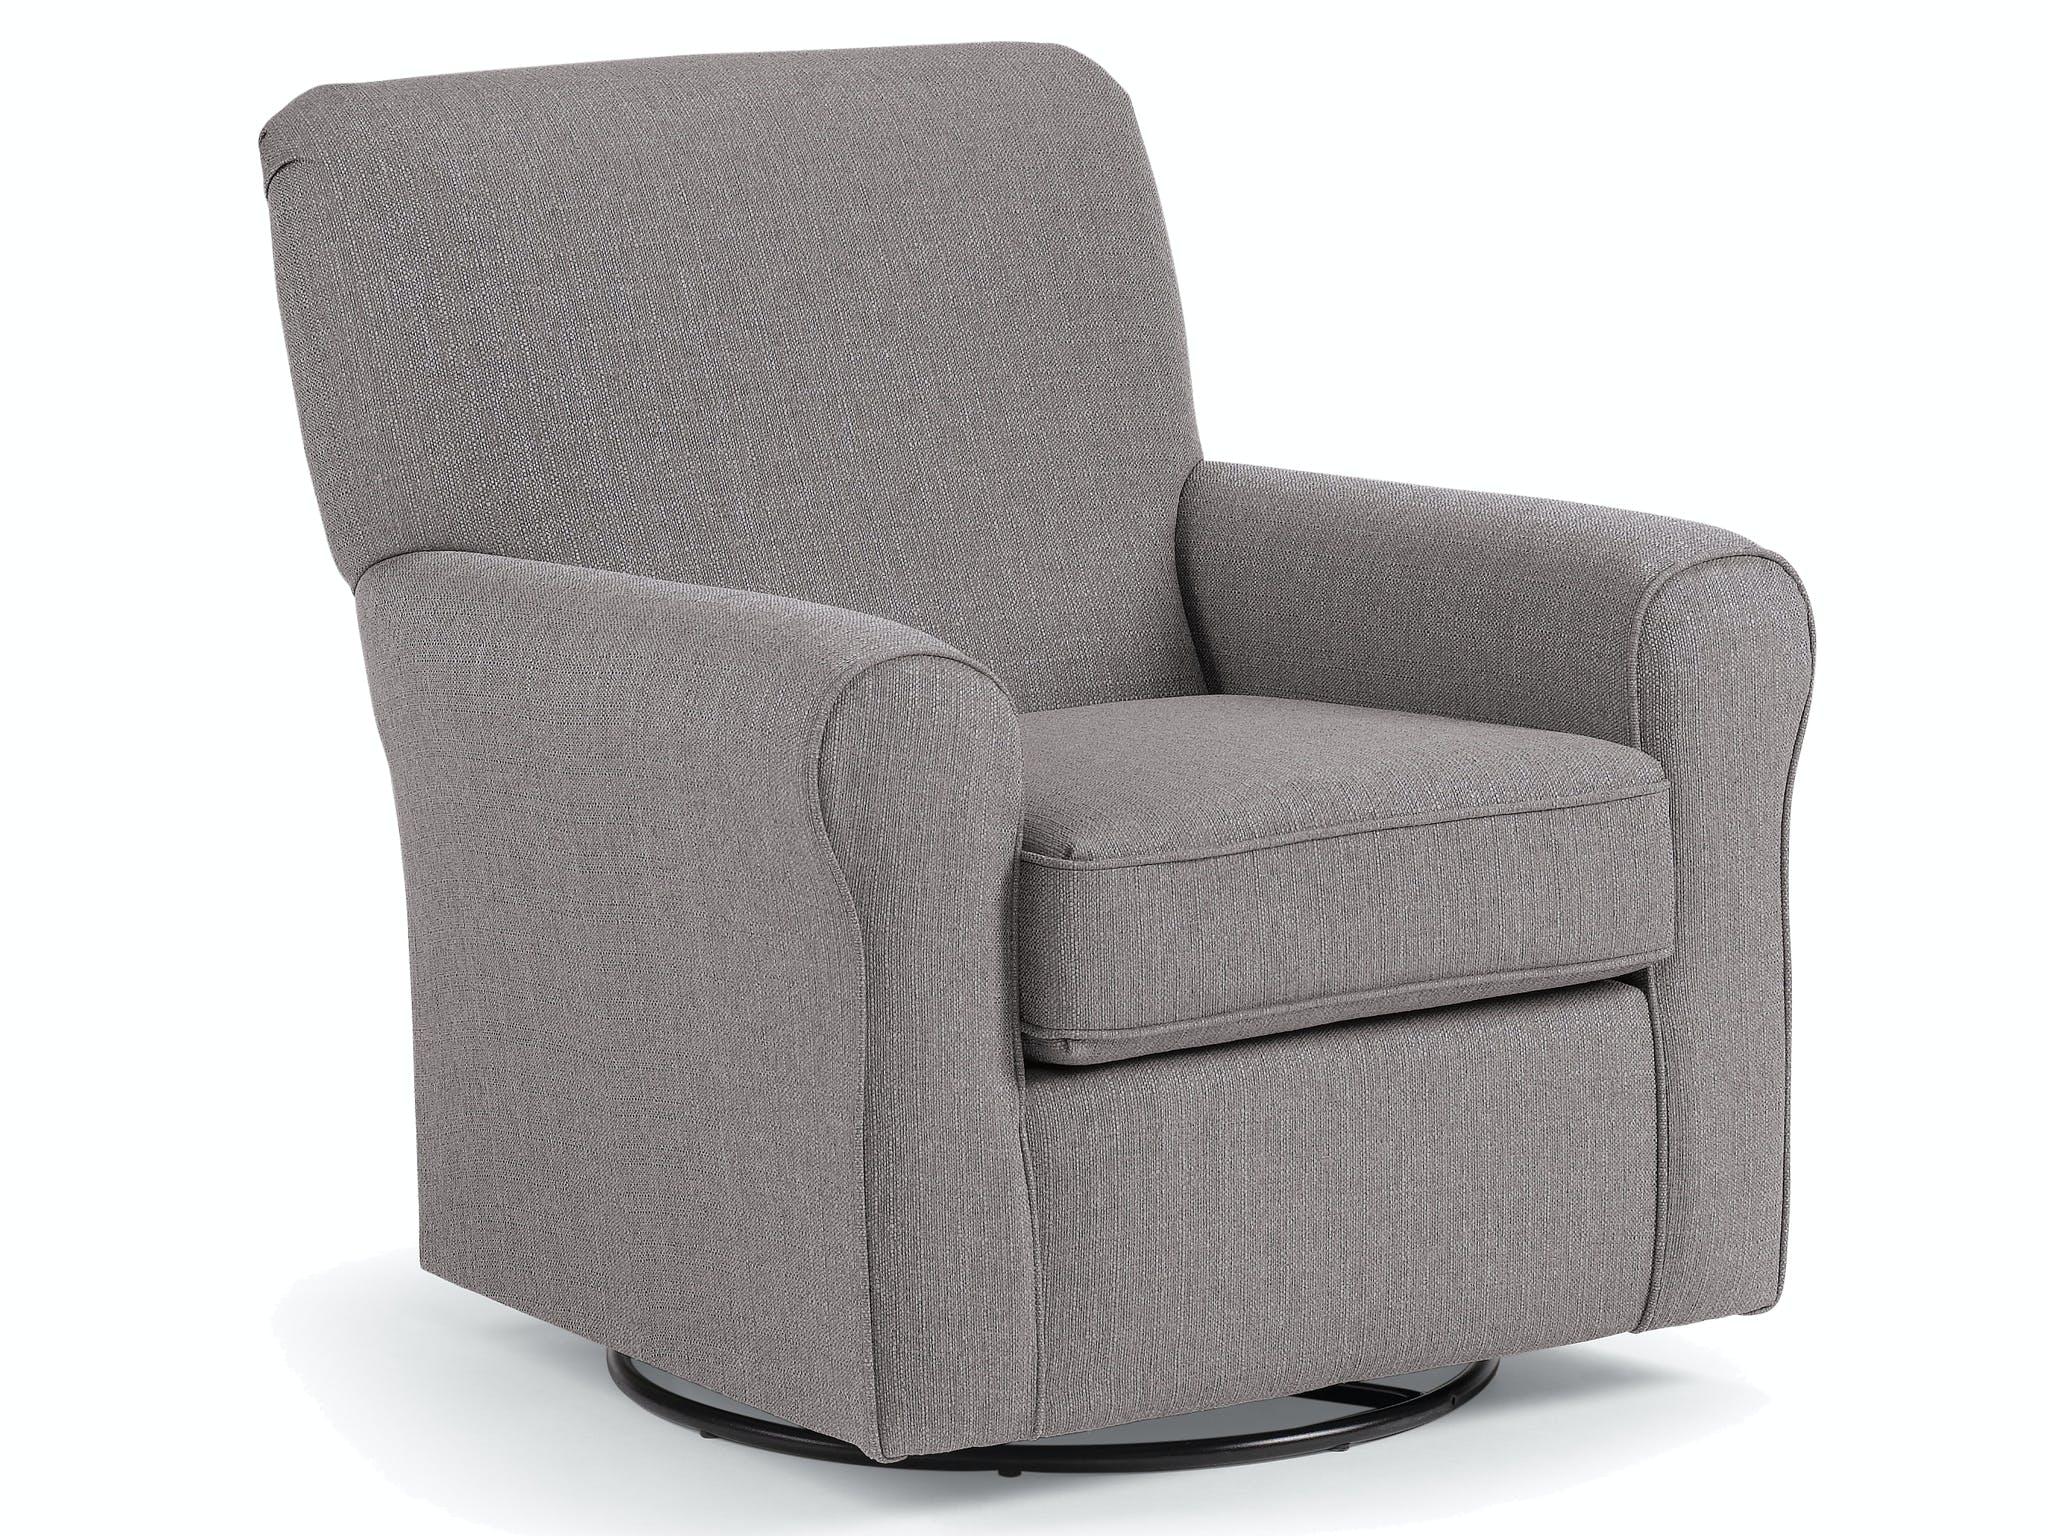 Best Home Furnishings Living Room Swivel Glider 4177 Carol